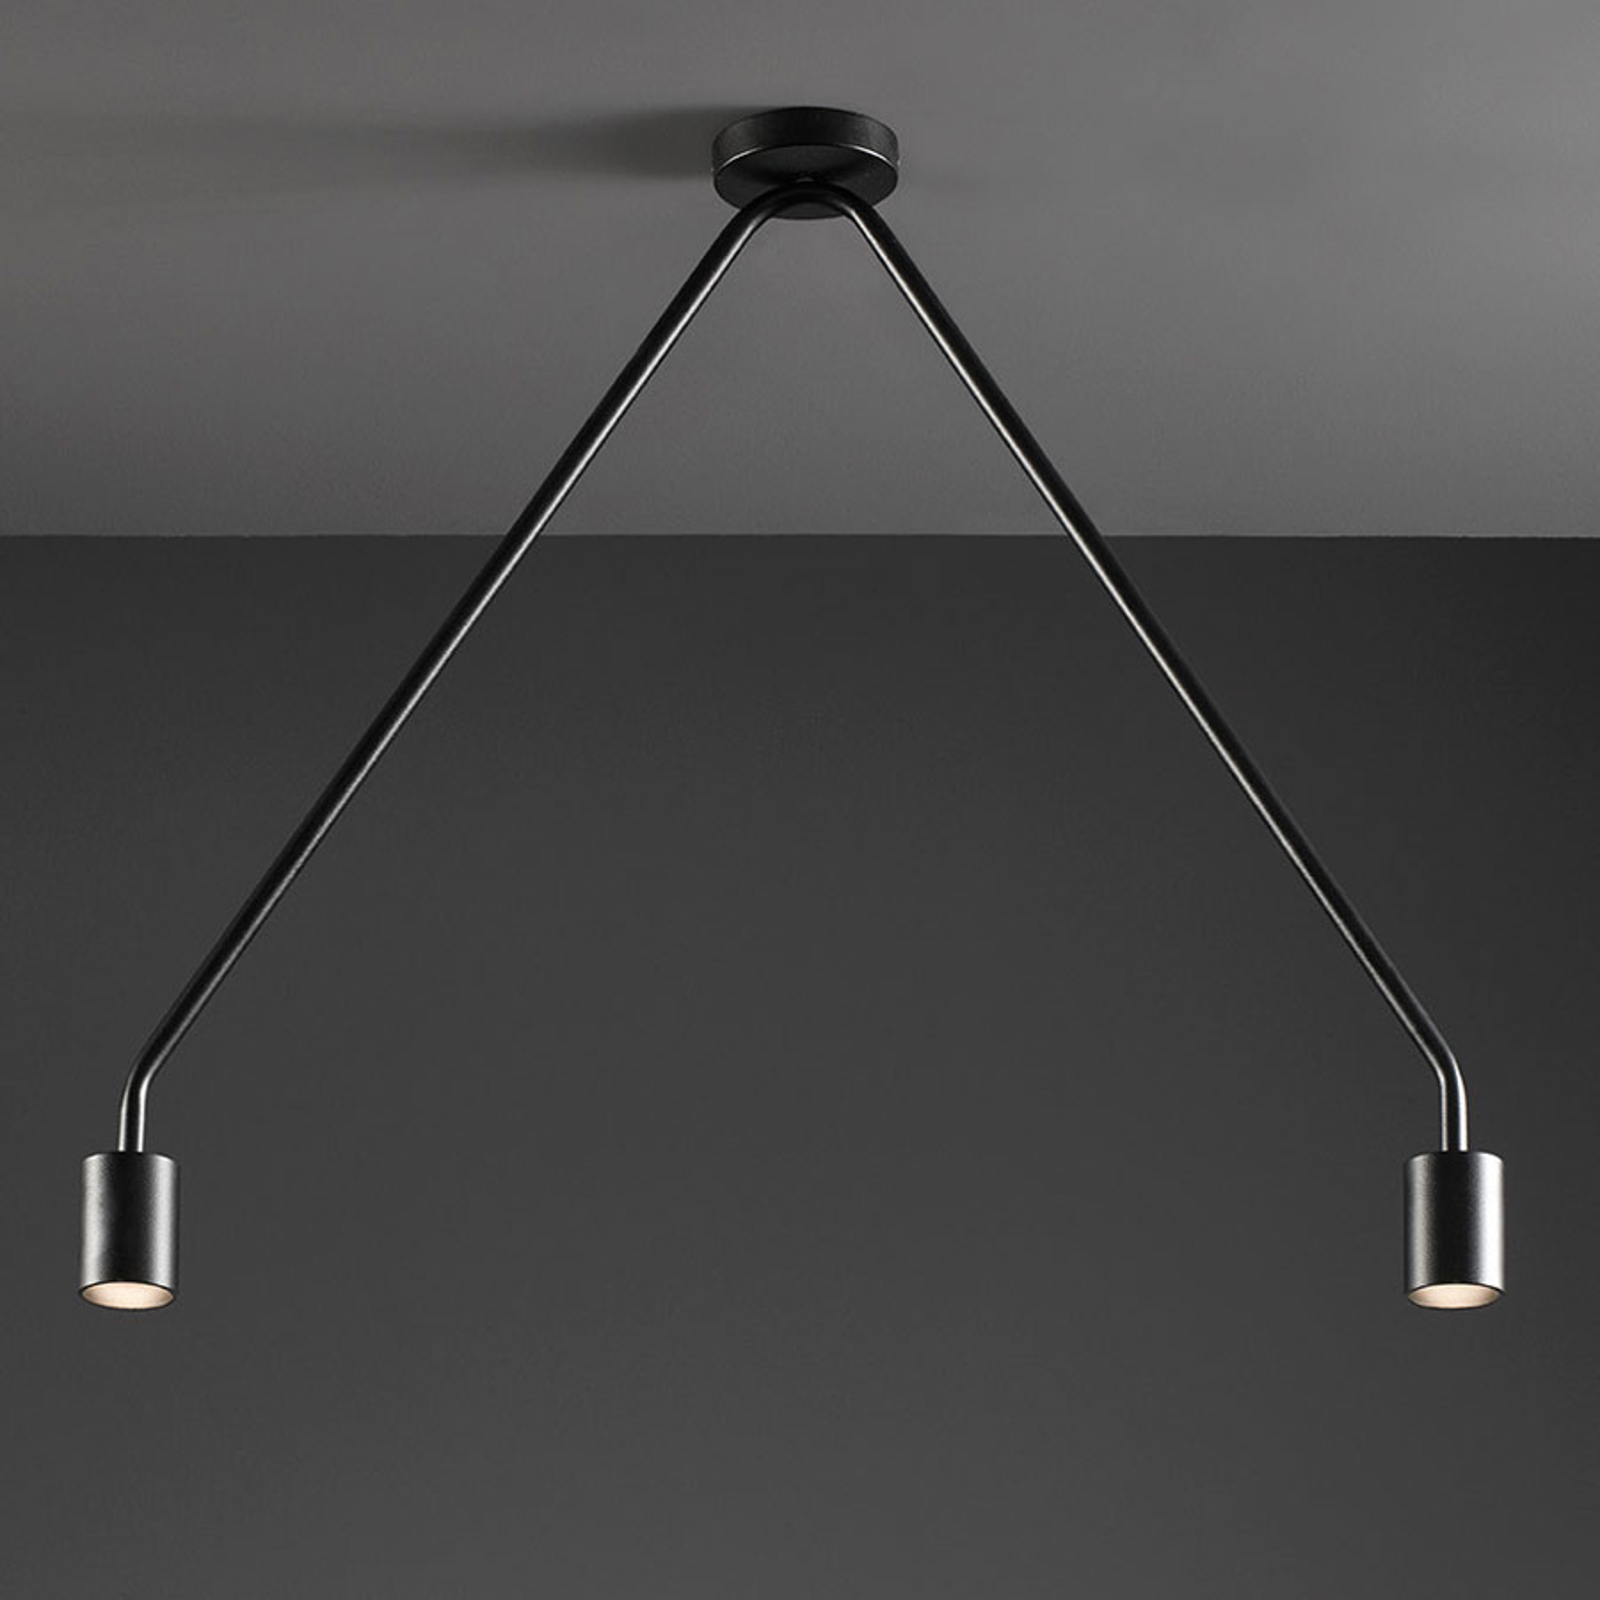 Acquista Plafoniera LED Caos nera a 2 luci